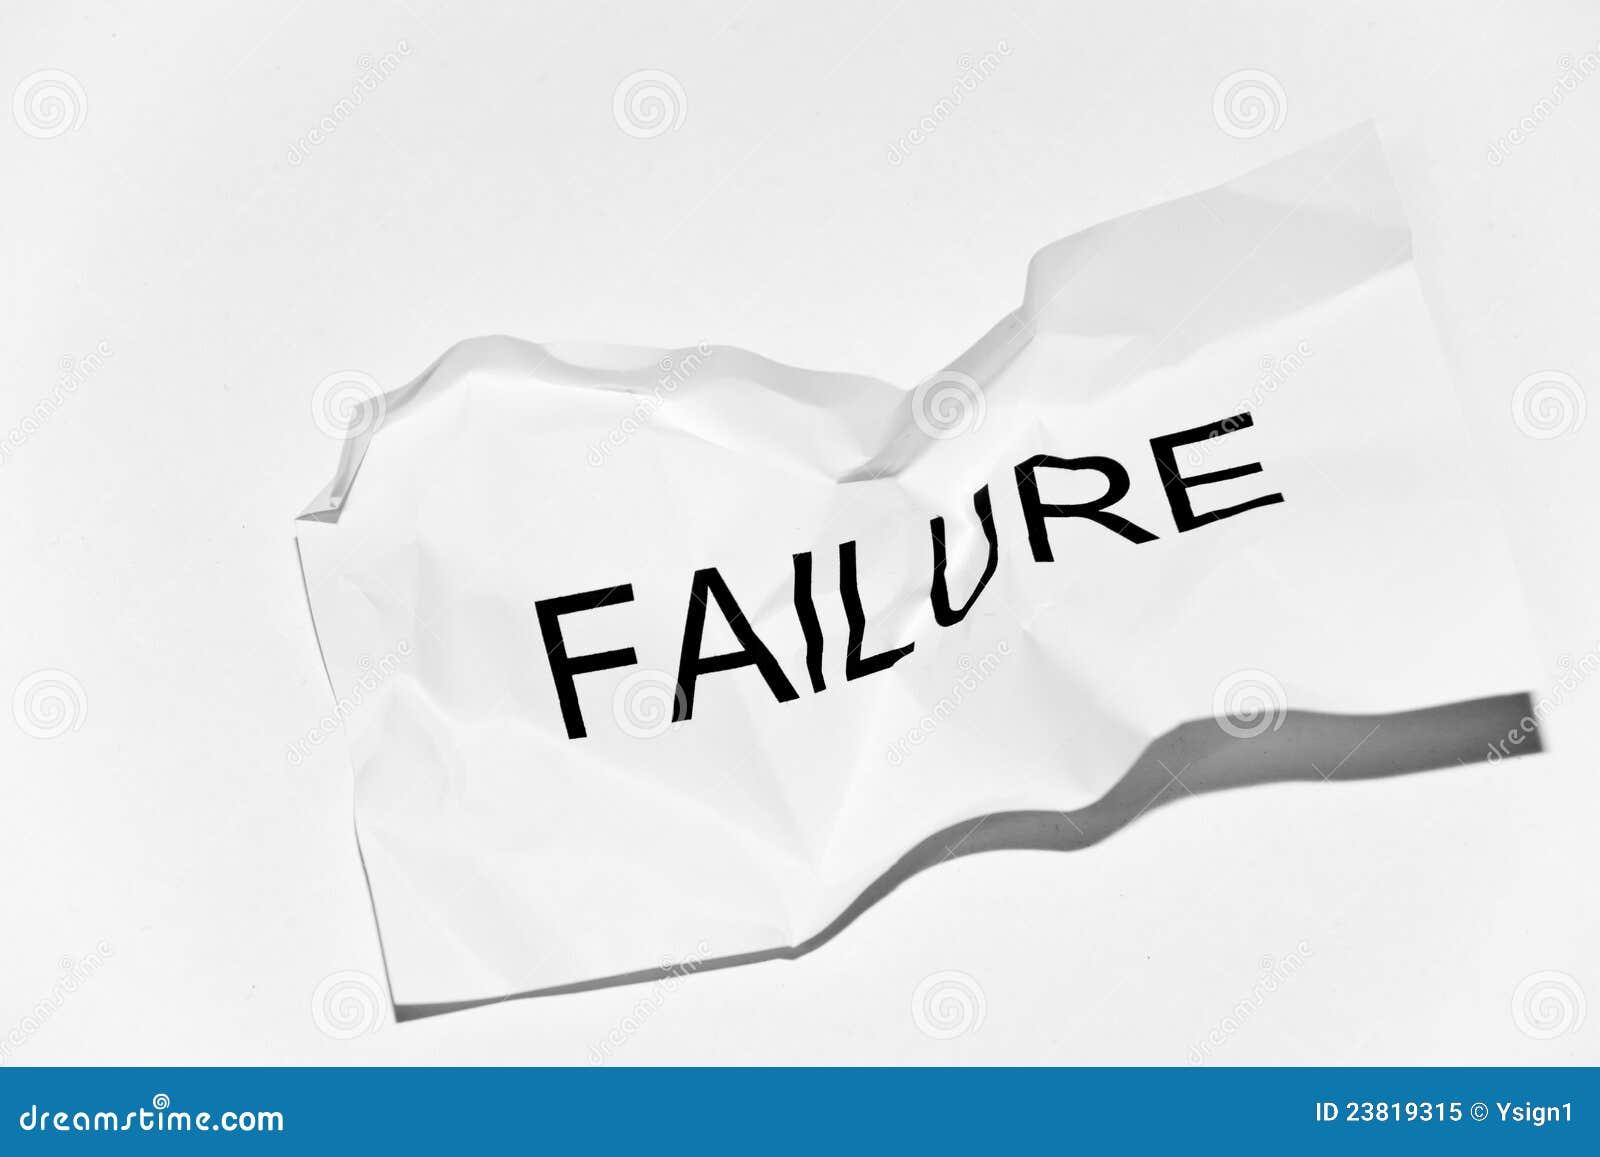 Failure Royalty Free Stock Photo - Image: 23819315